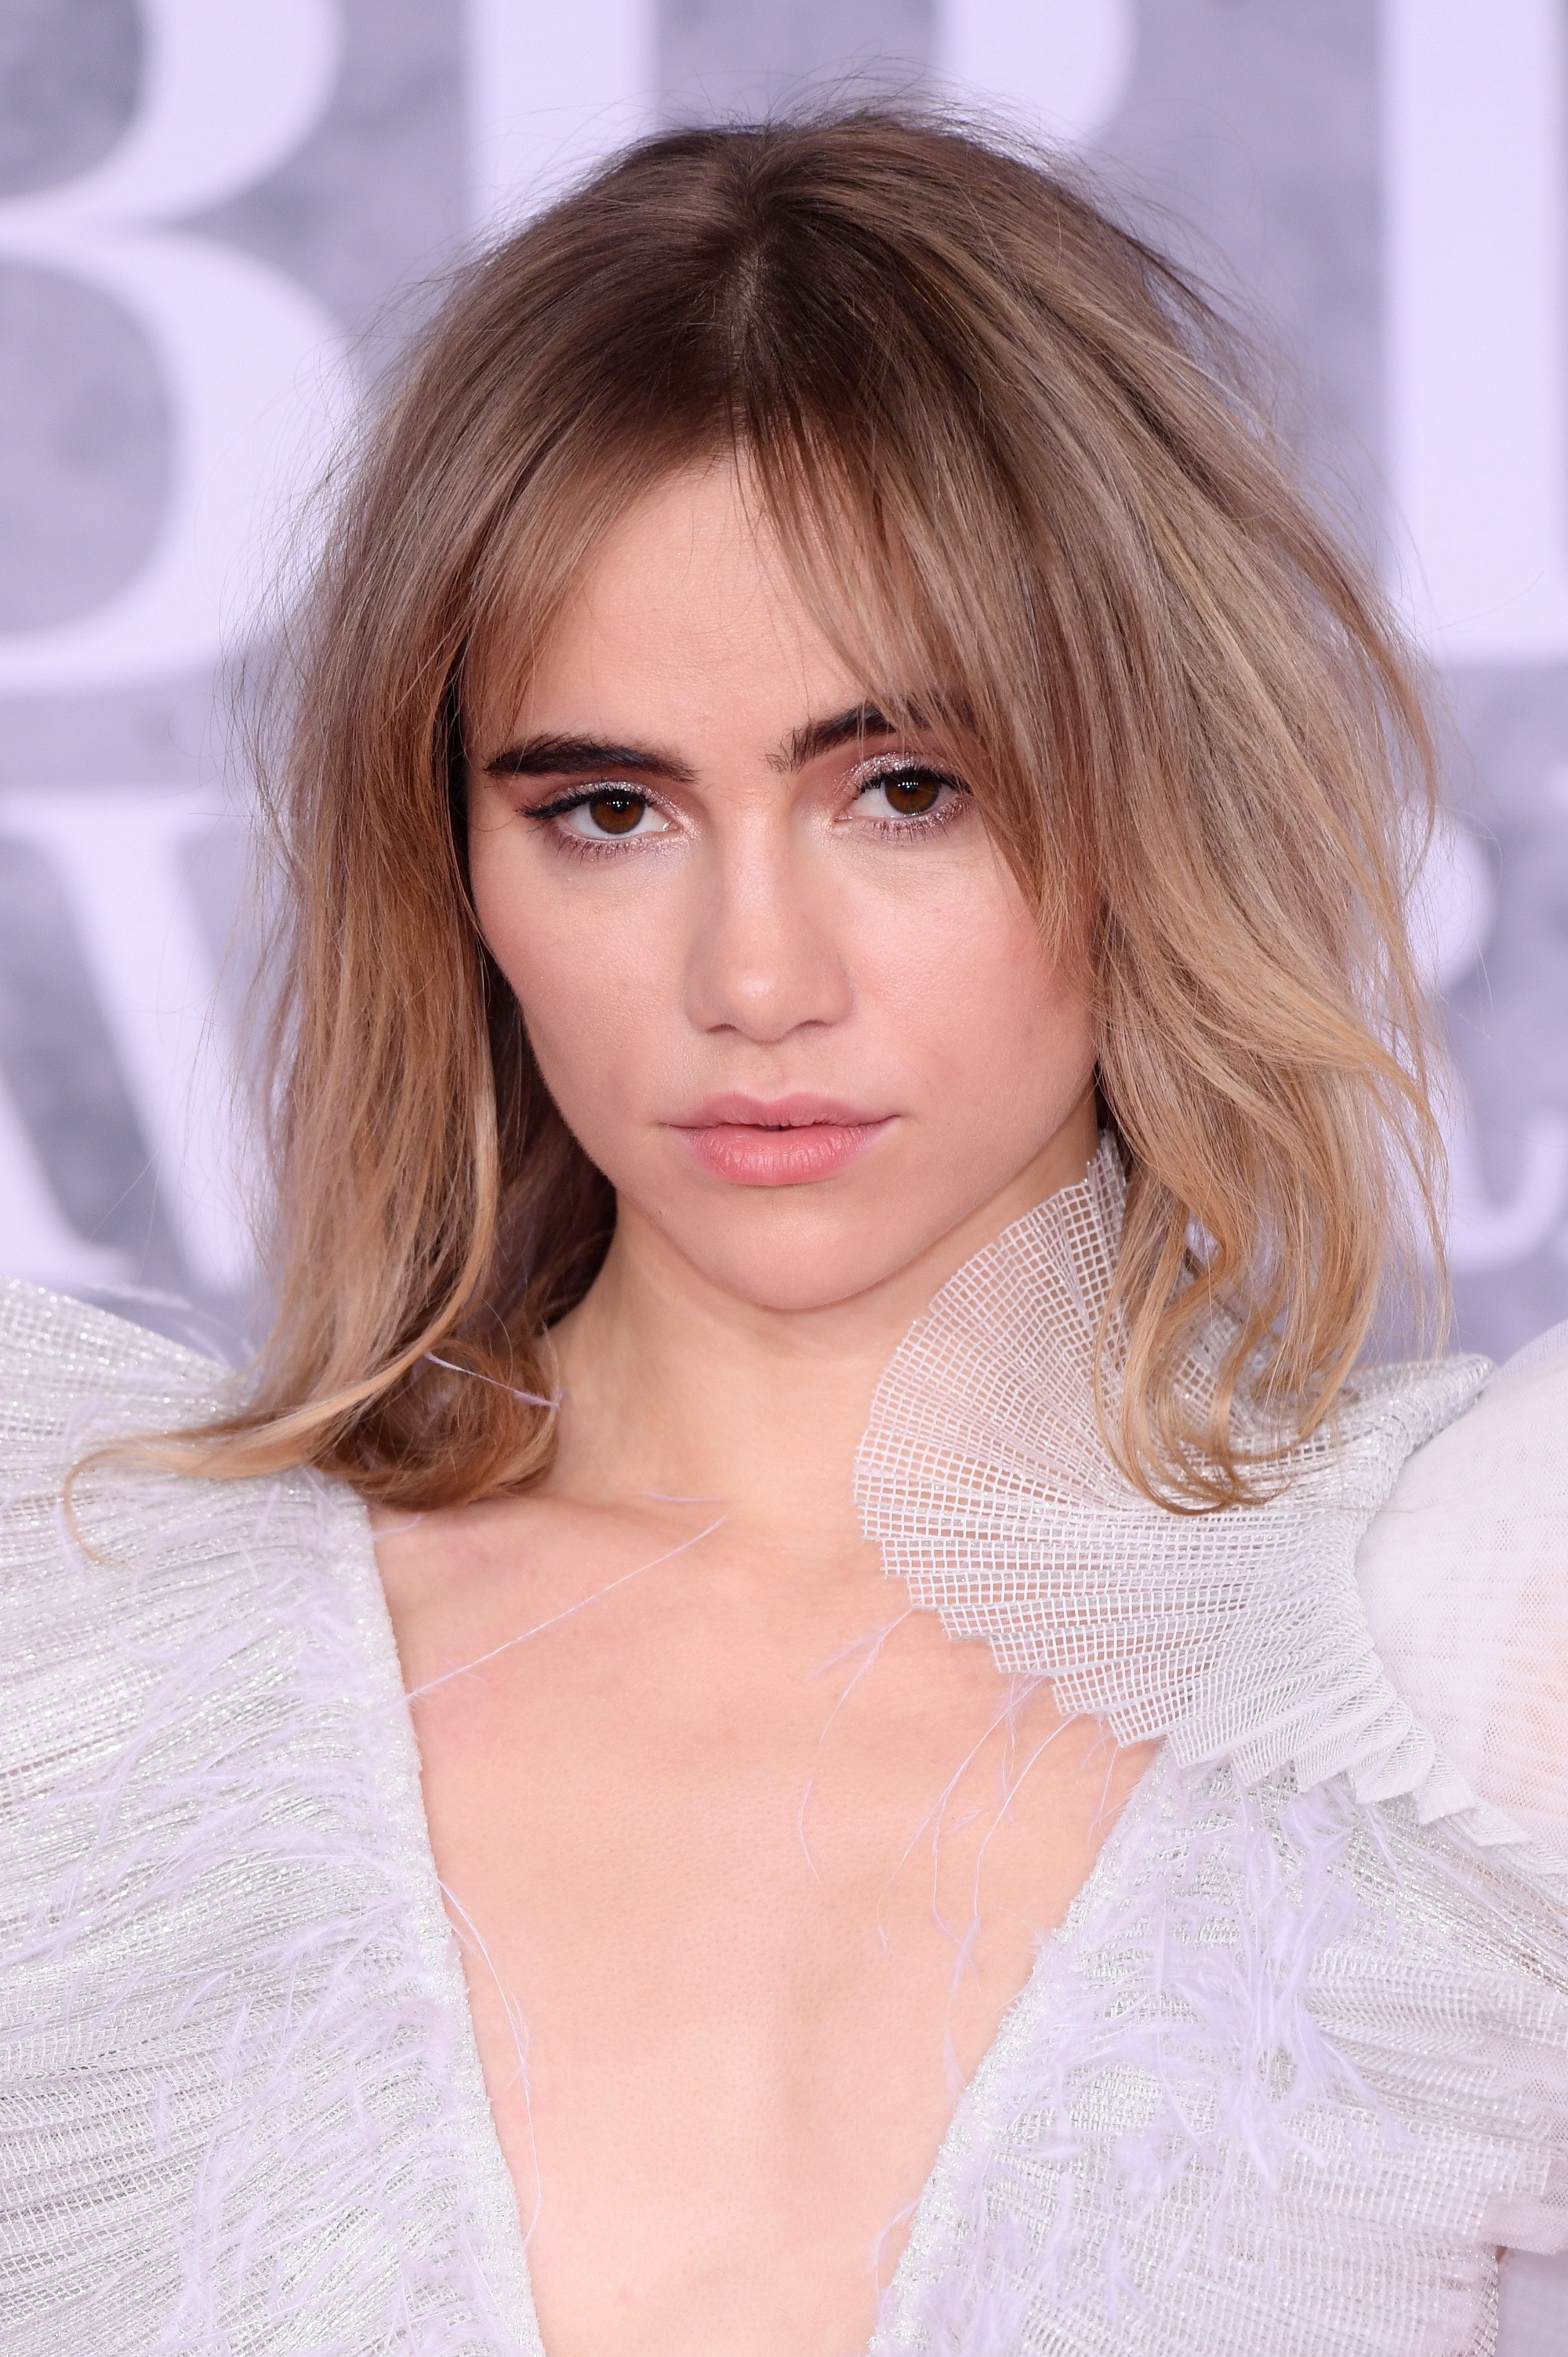 Spring haircuts: Suki Waterhouse at the 2019 Brit Awards with mid-length bronde shaggy layered hair, wearing a ruffled dress